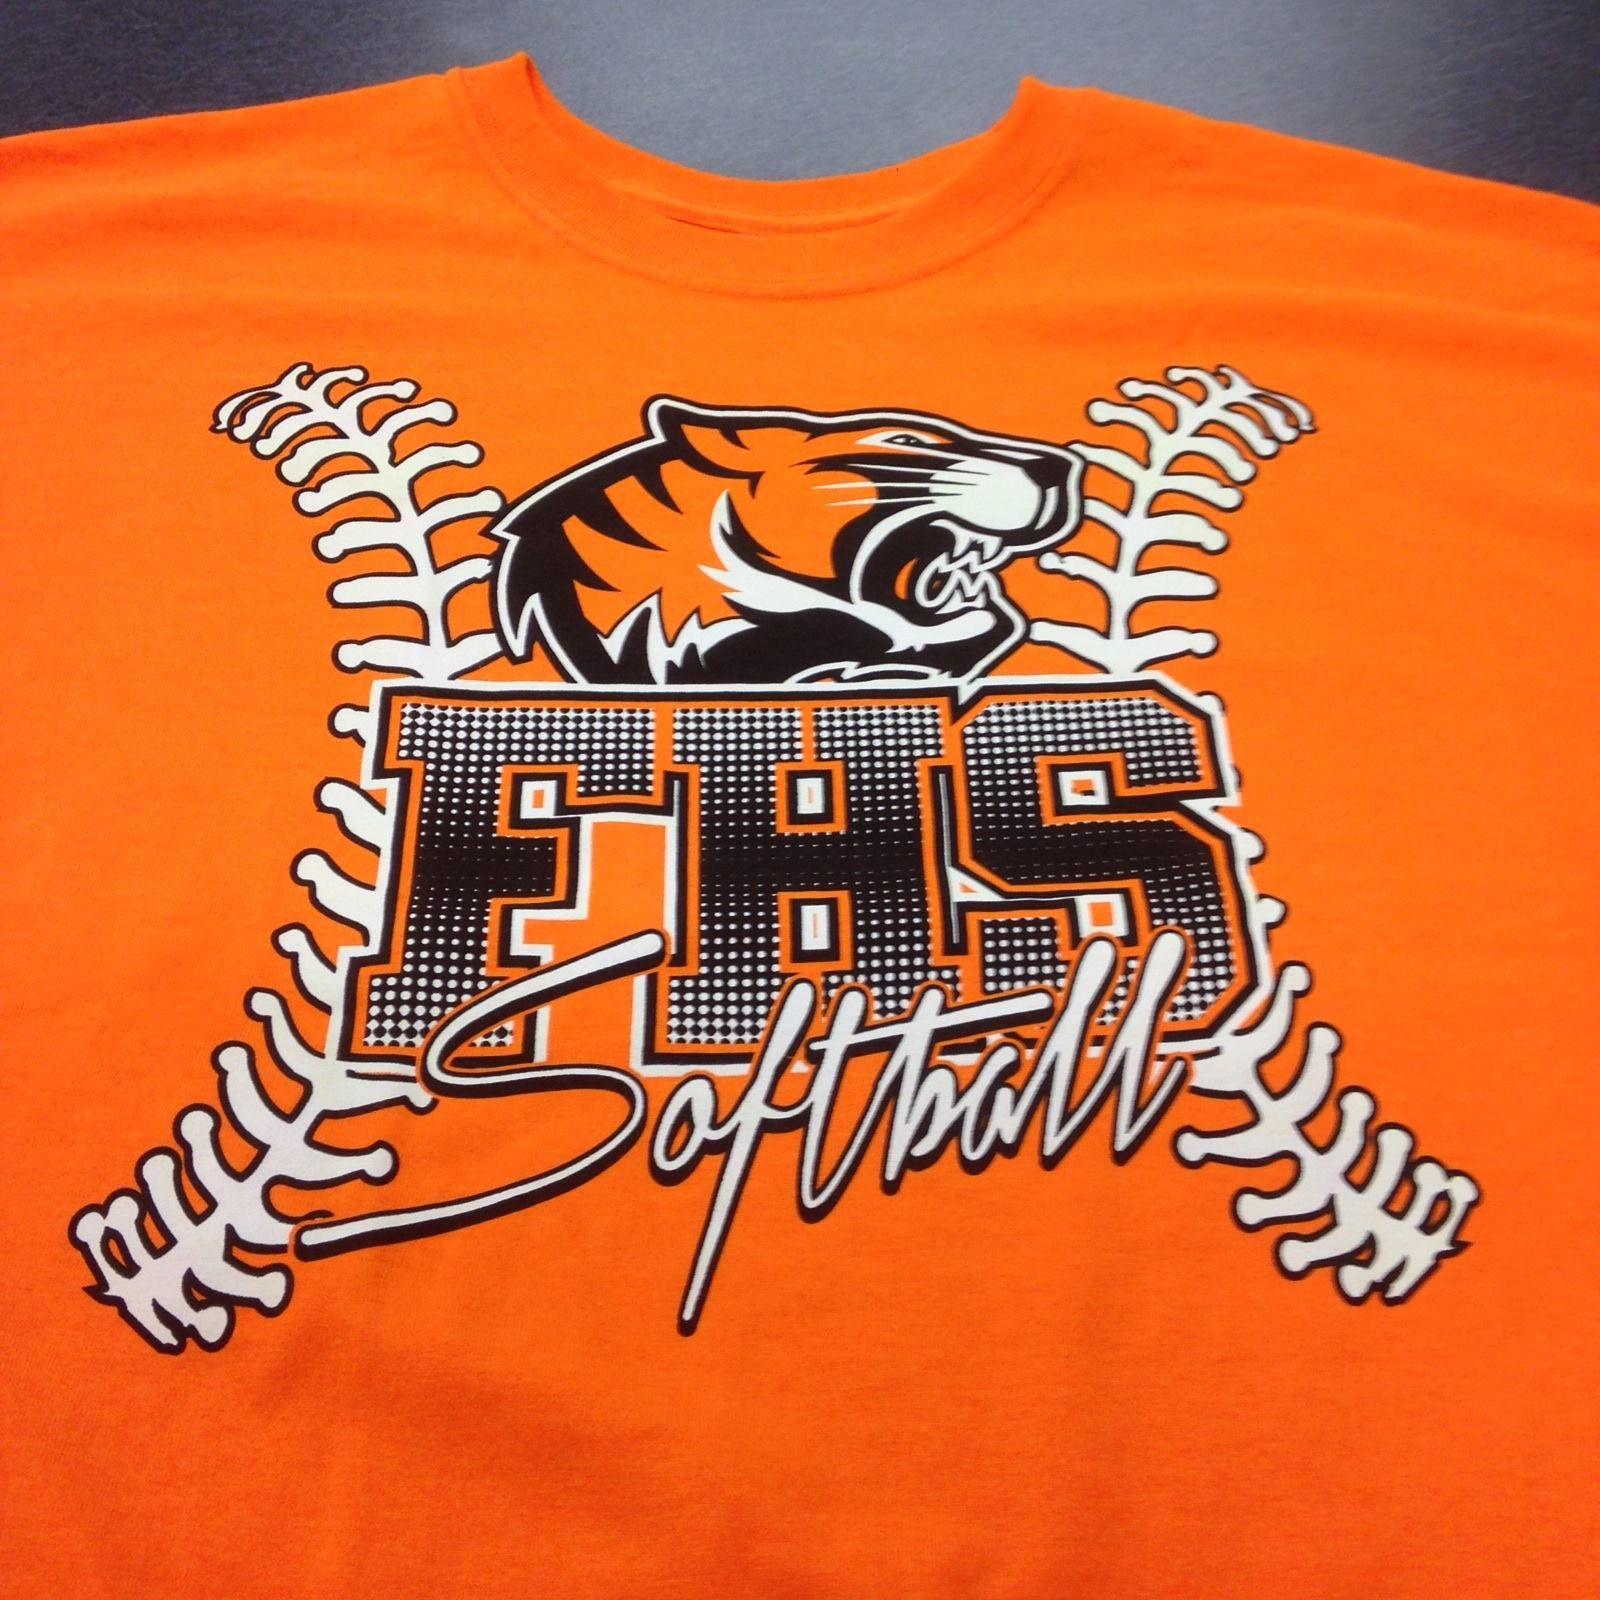 Softball tshirts fayettevillehigh tennessee Softball